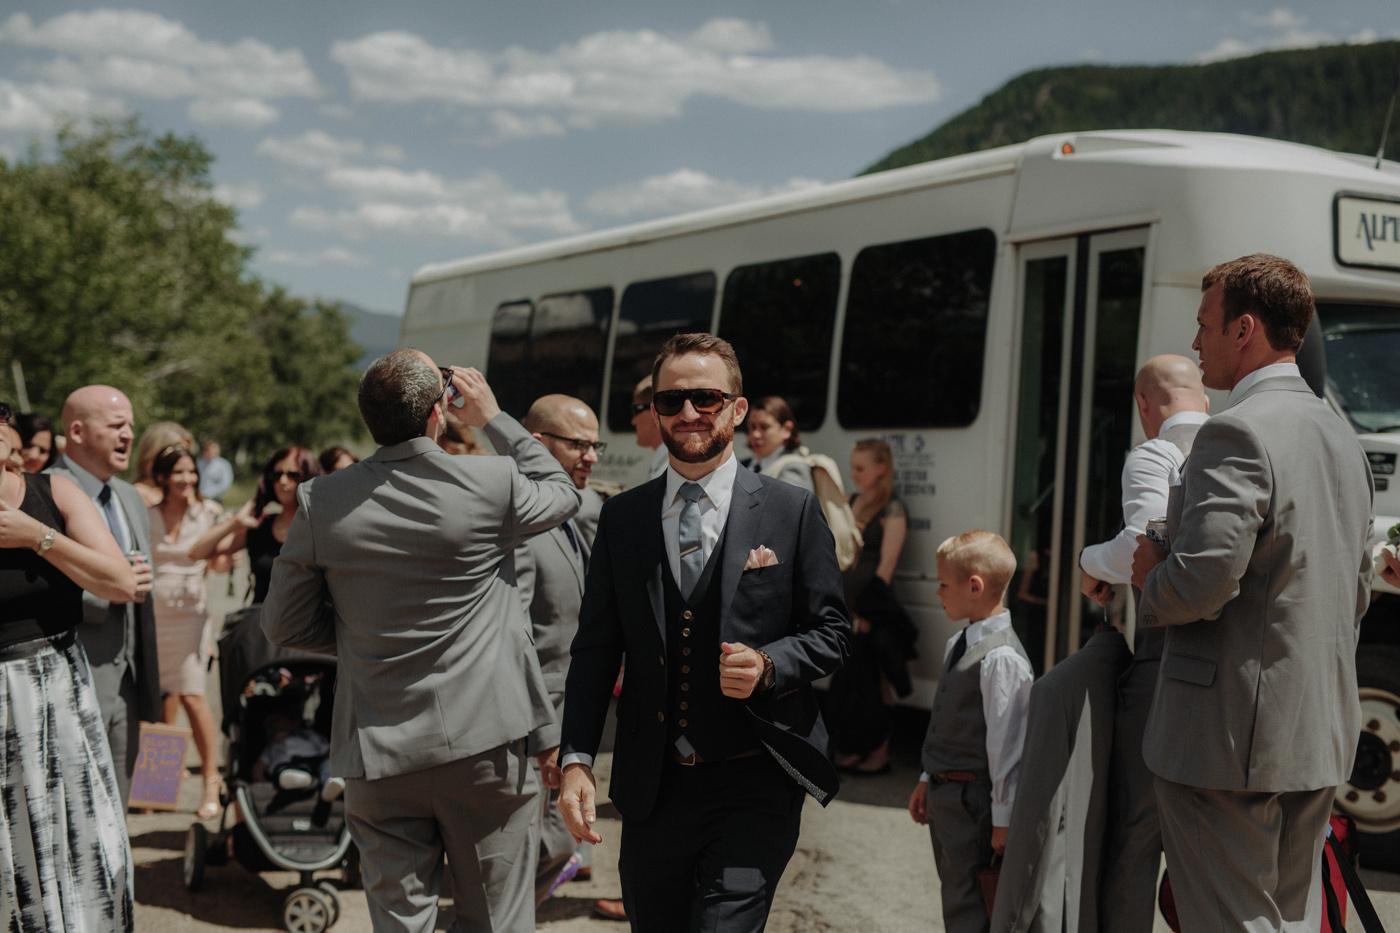 woods-walk-trail-crested-butte-colorado-wedding-3.jpg